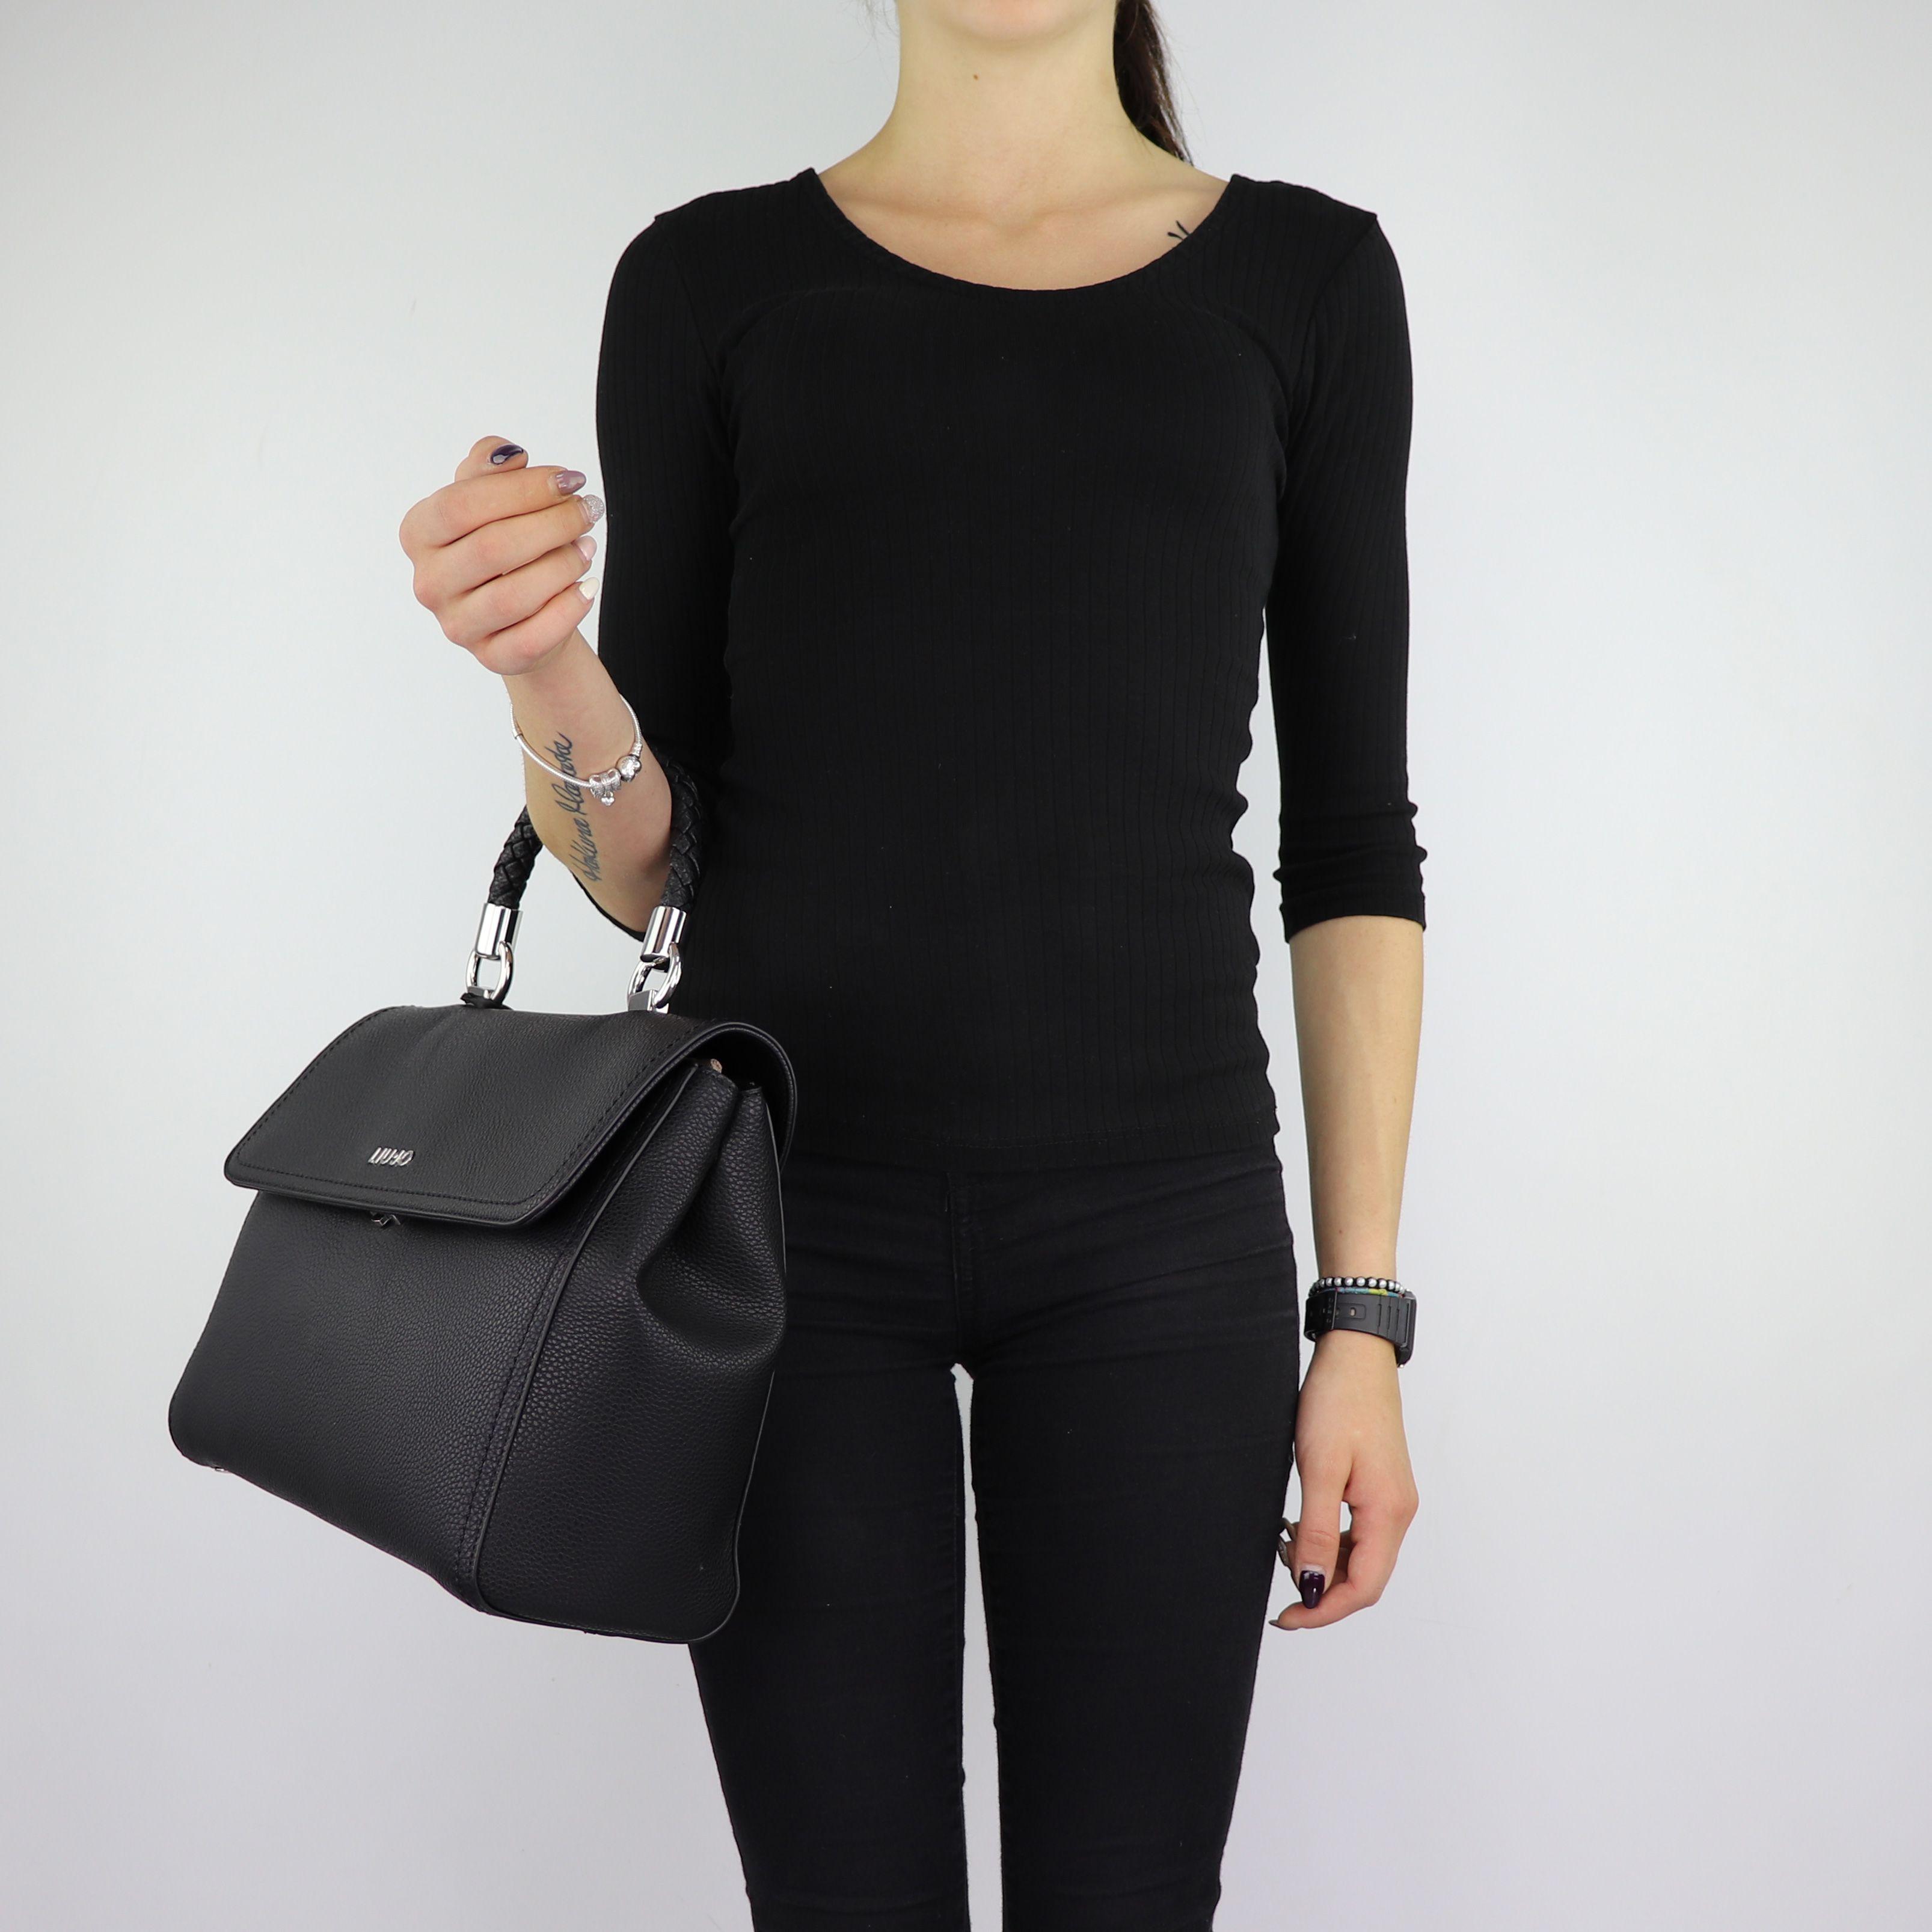 Bag Folder Liu Jo with top handle Manhattan black size M